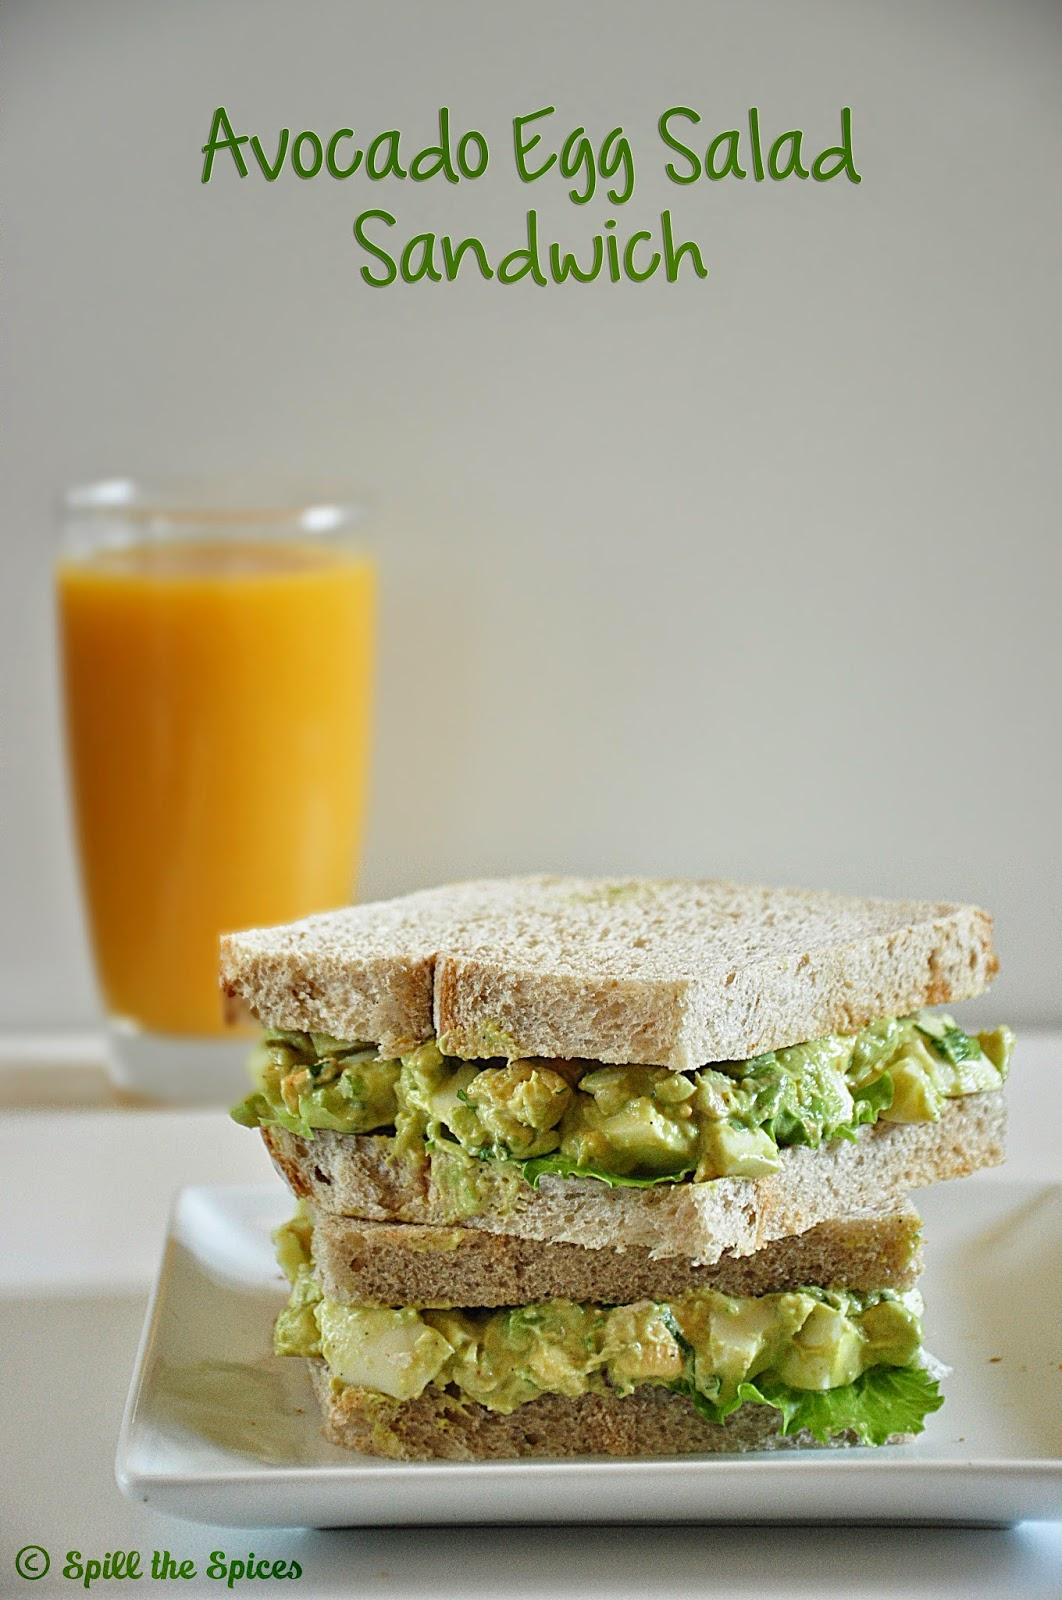 Healthy Avocado Sandwich Avocado Egg Salad Sandwich